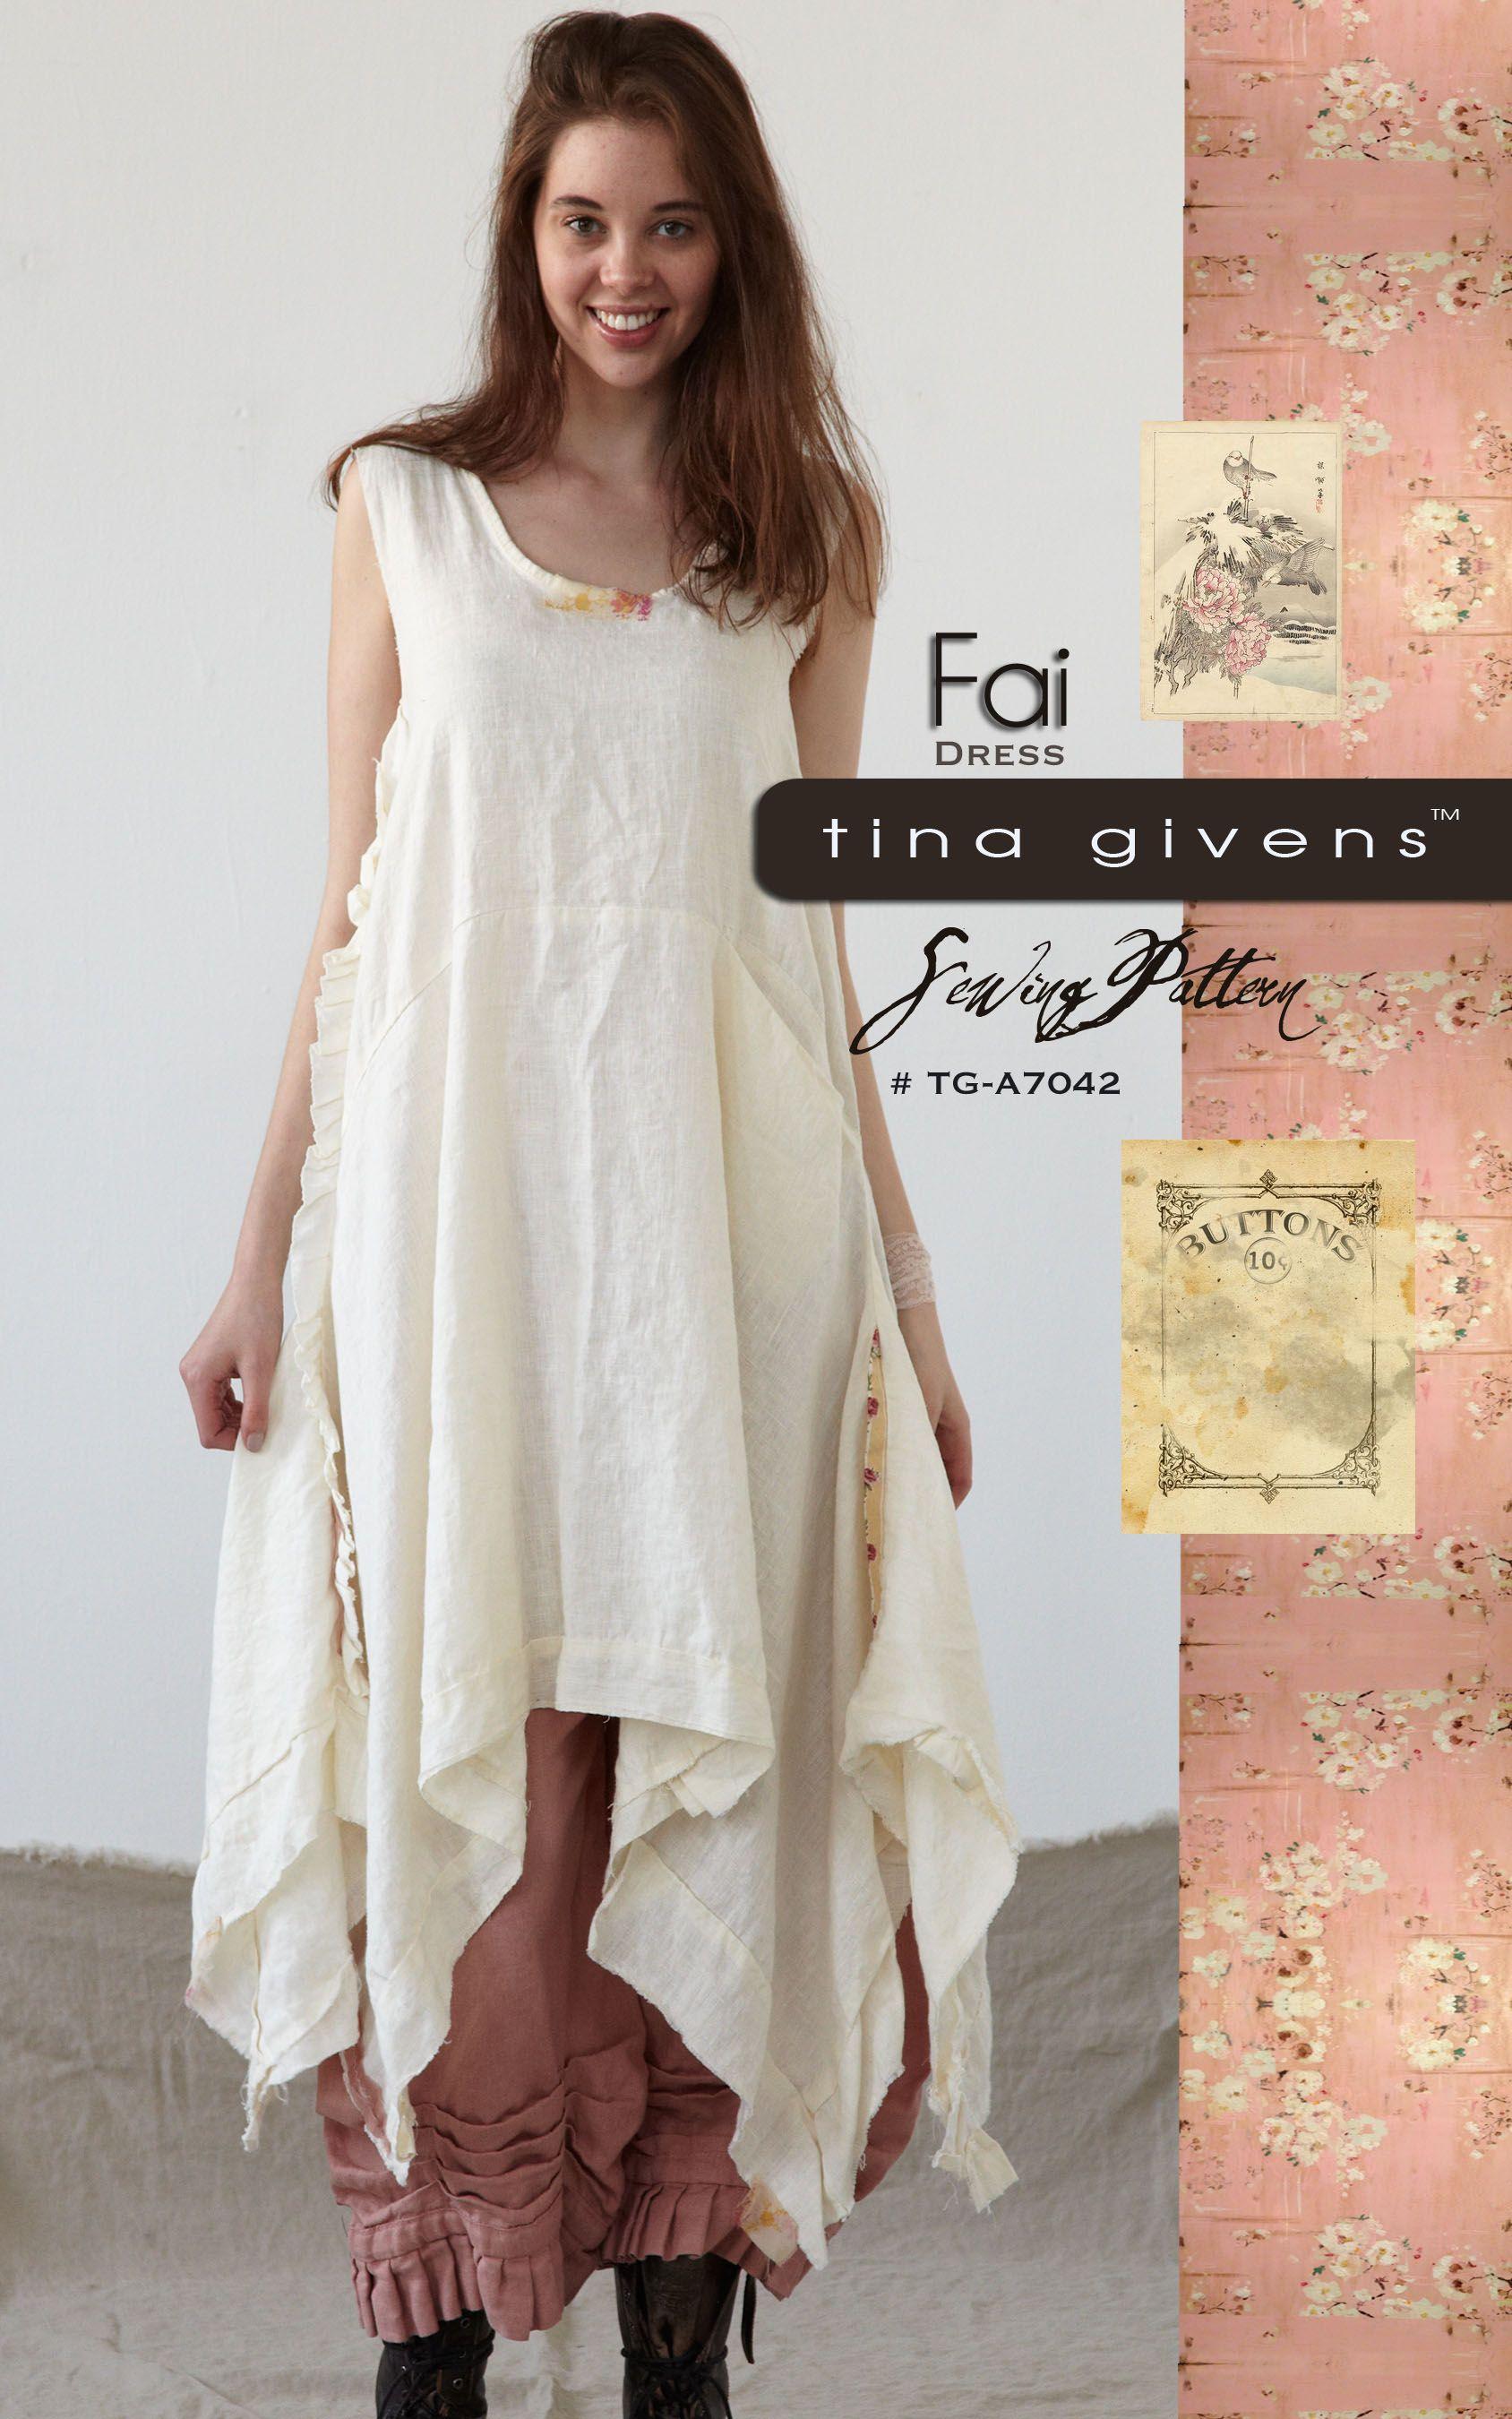 TG-A7042 FAI DRESS